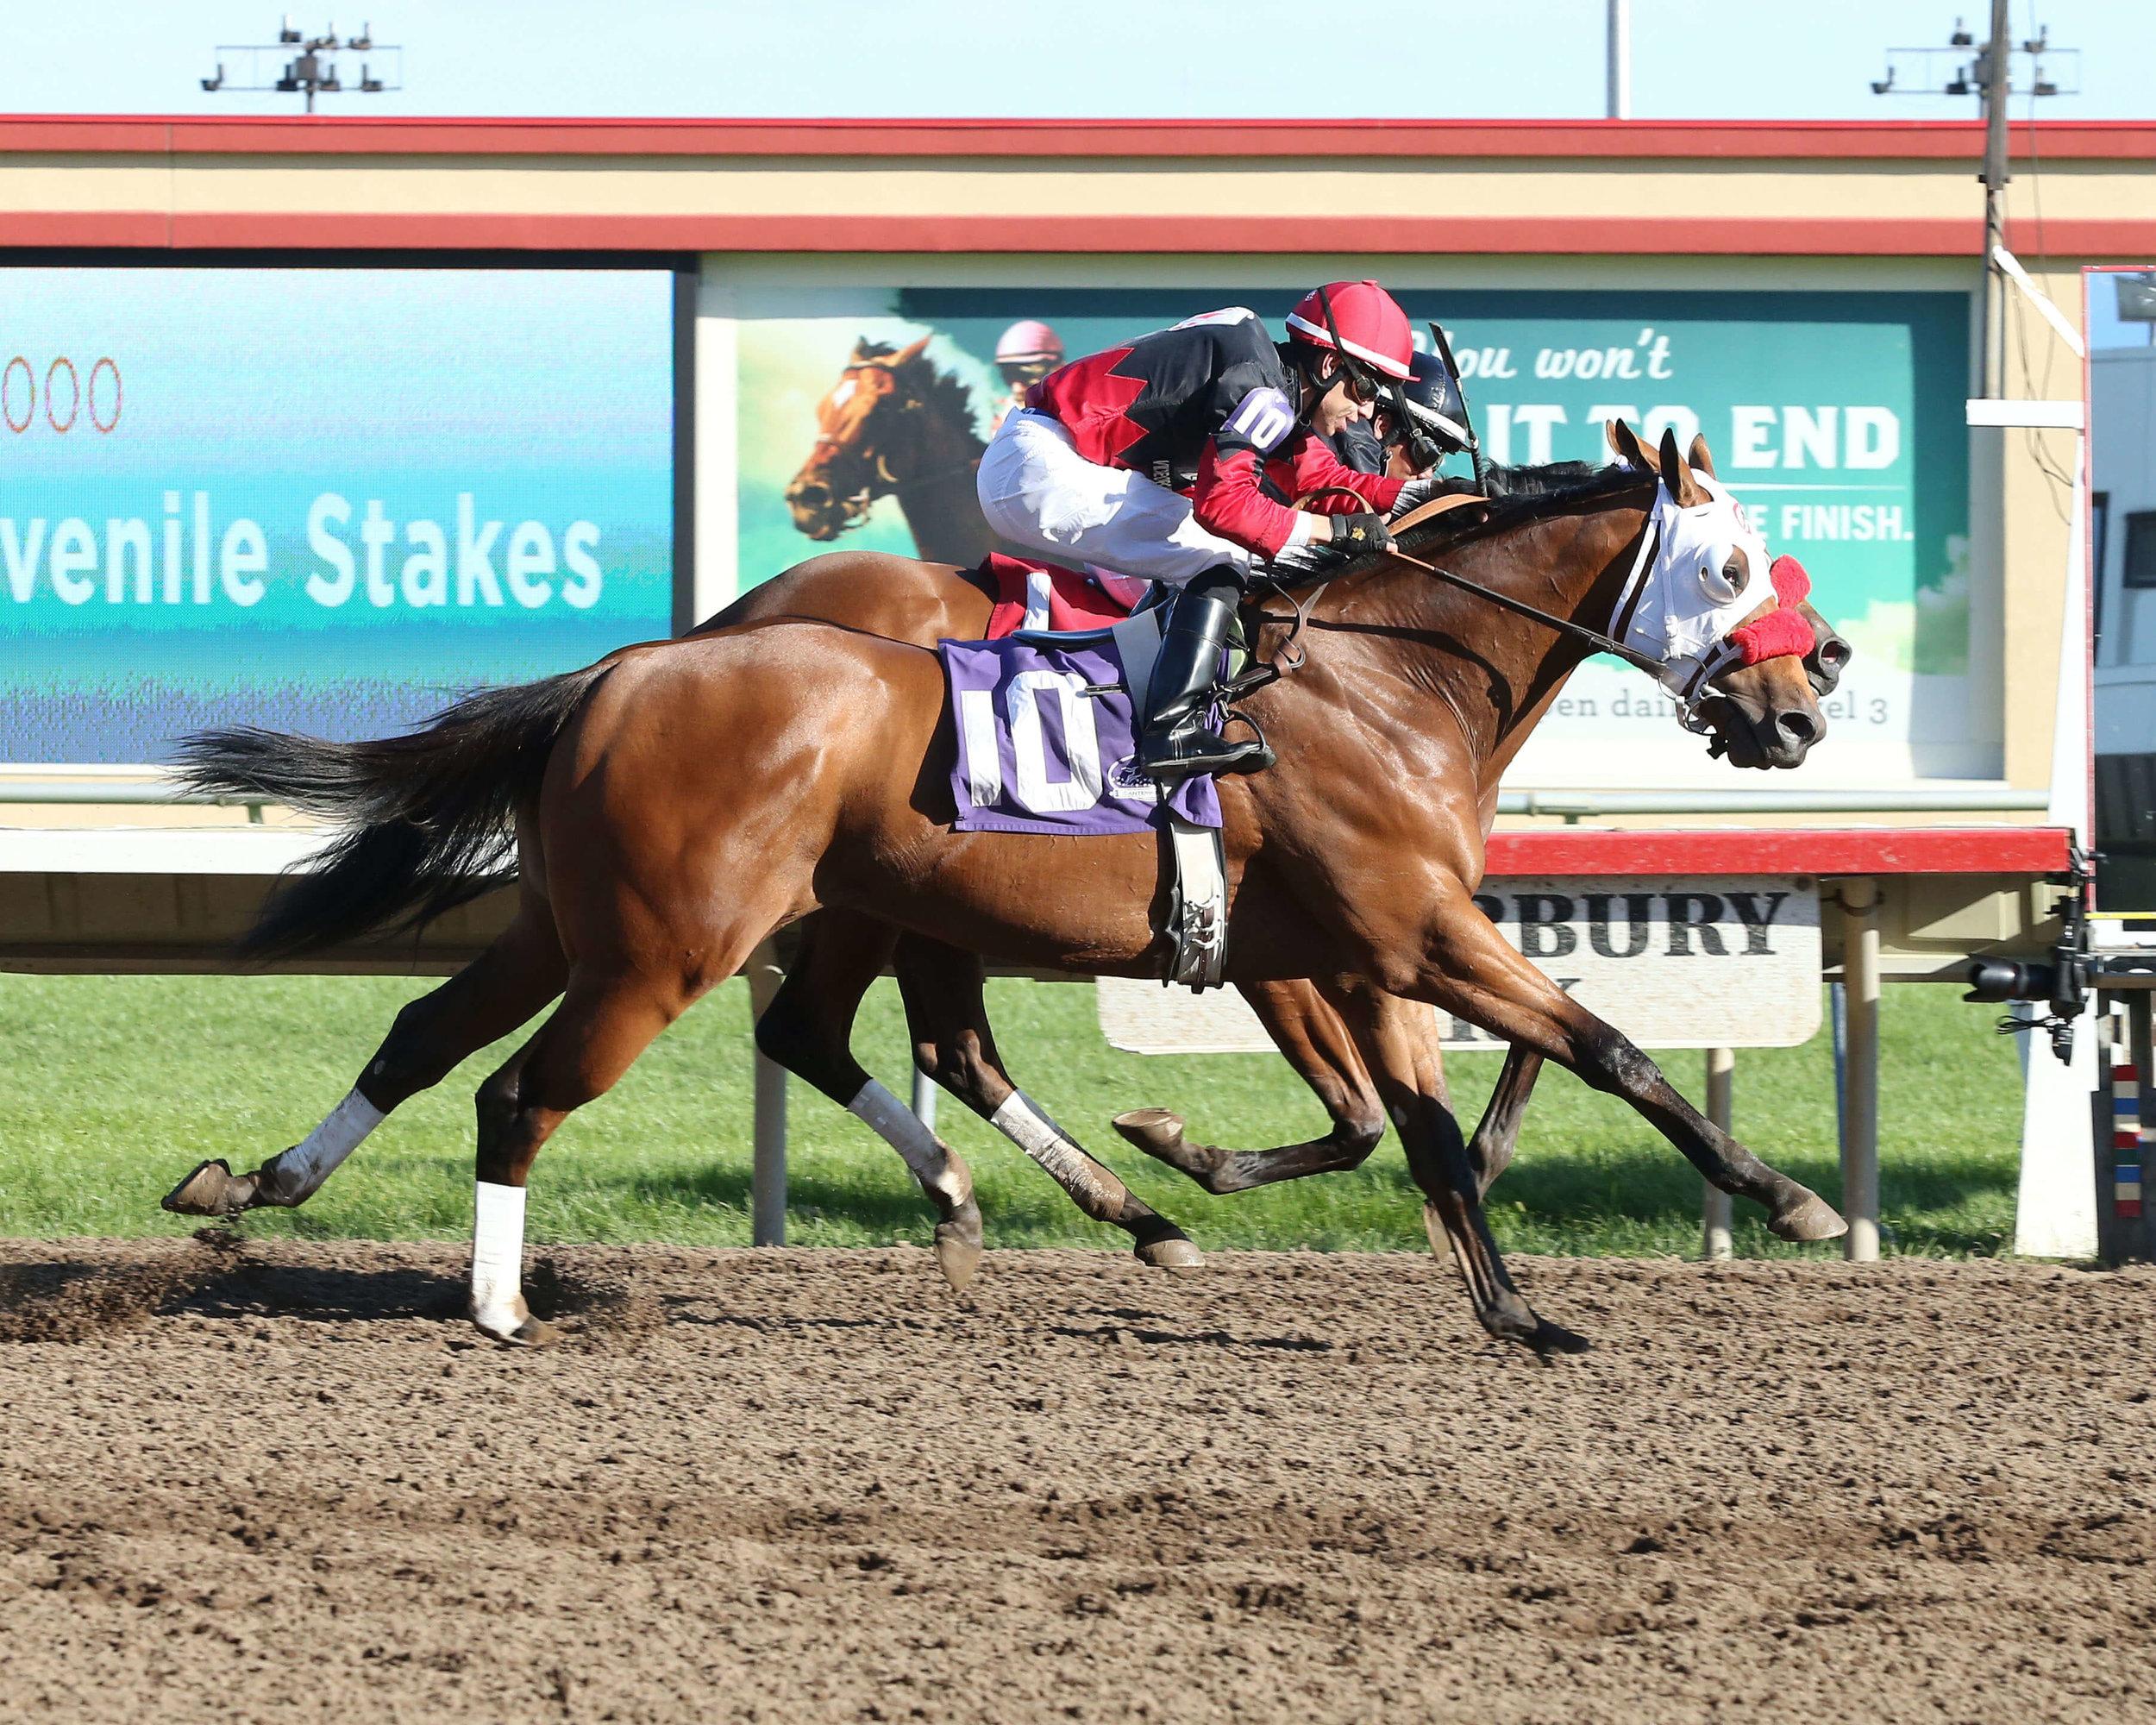 Native American & Grand Full Moon (DH) - Shakopee Juvenile Stakes - 09-13-14 - R09 - CBY - Finish (1).jpg